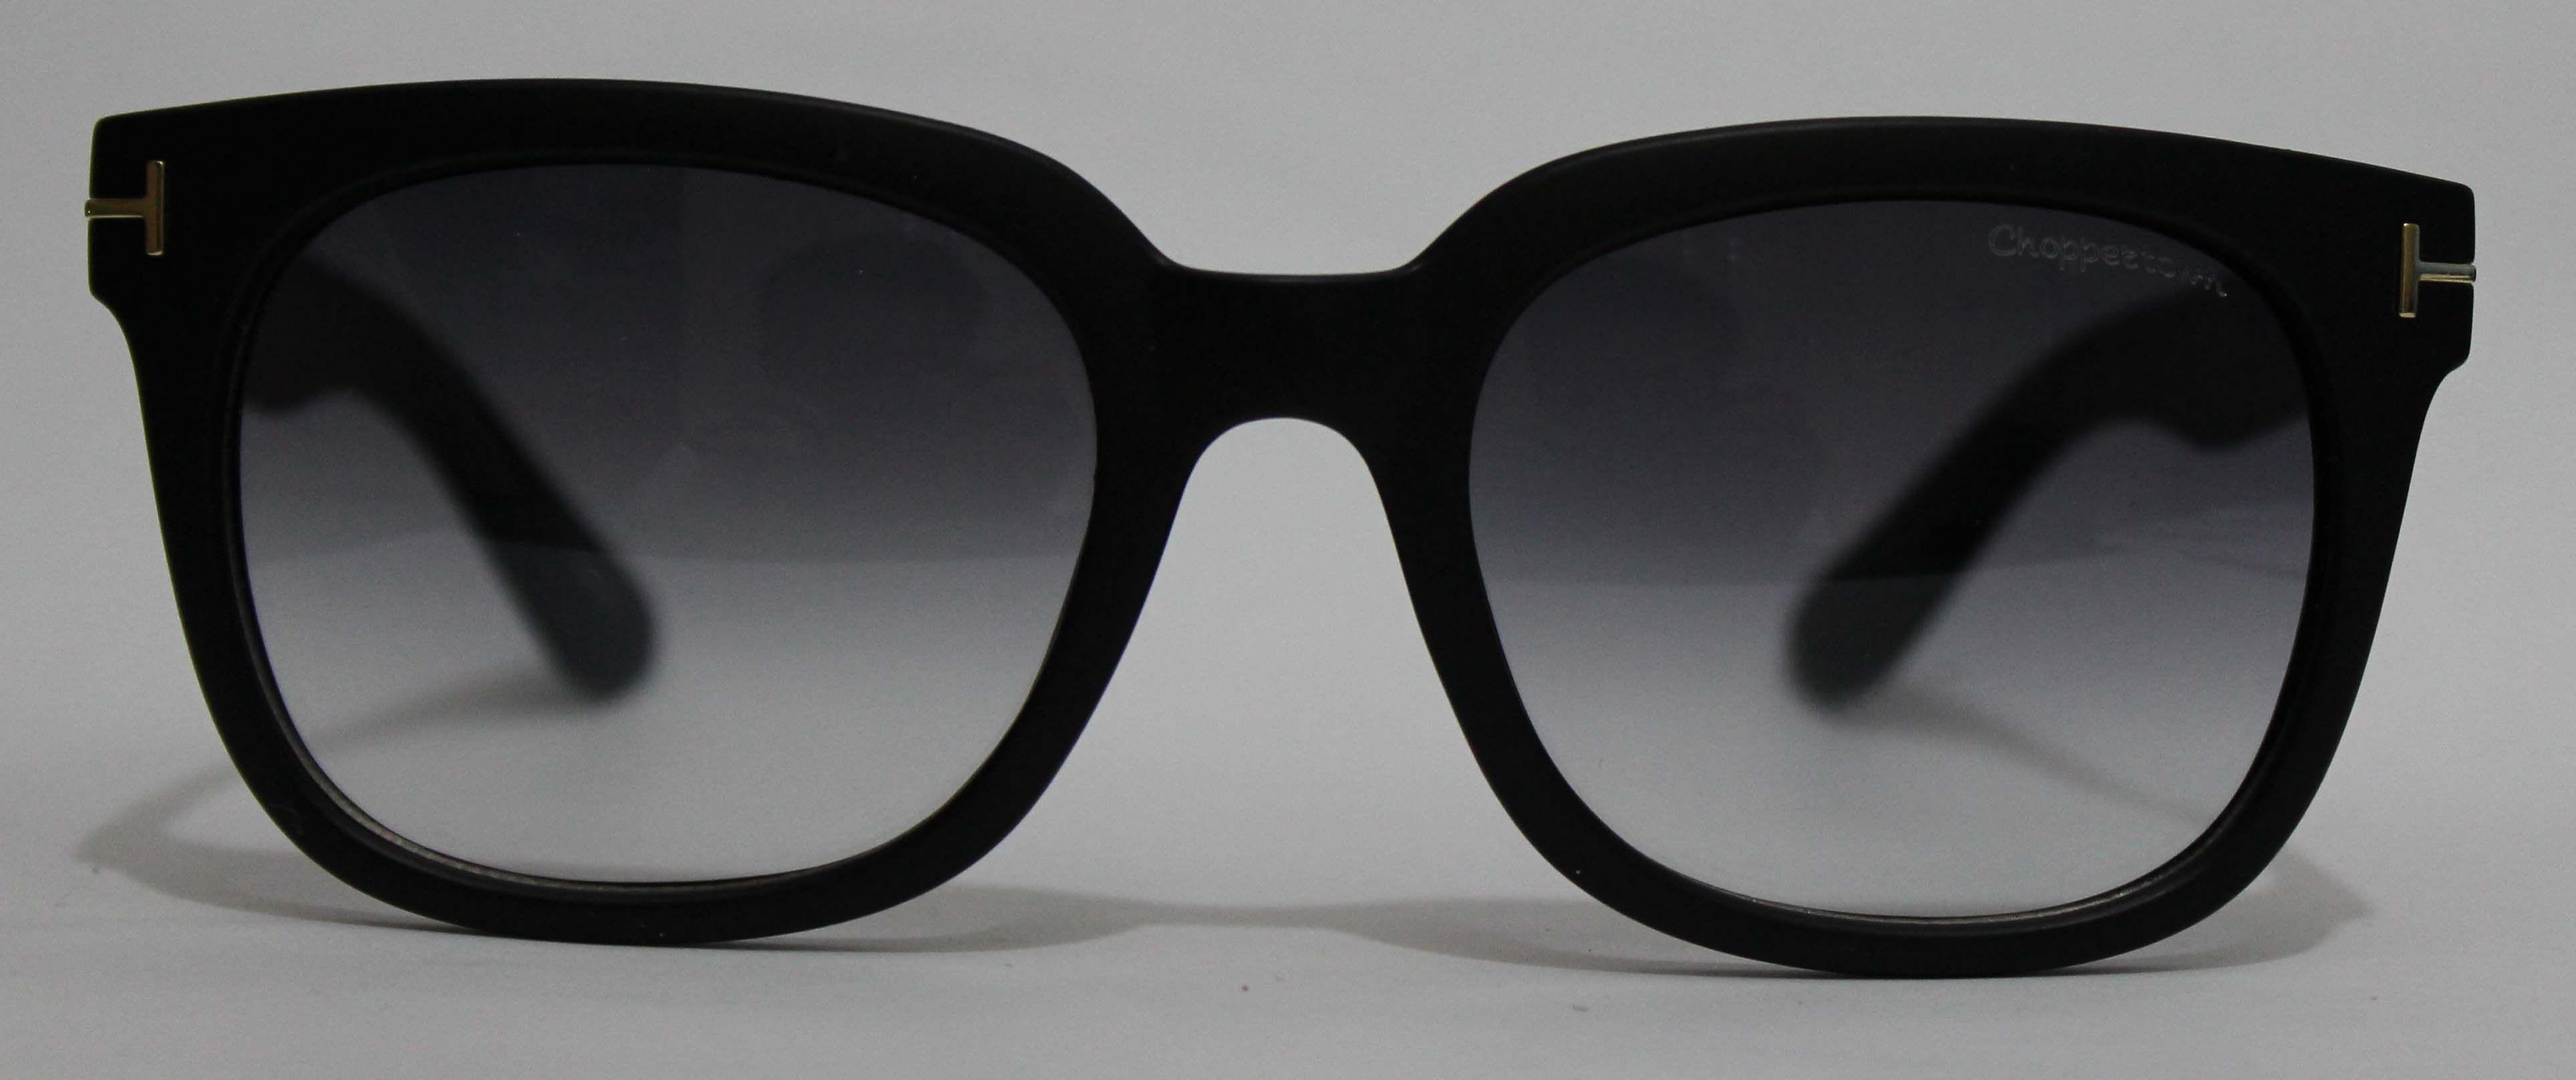 Óculos Choppertown modelo Old School